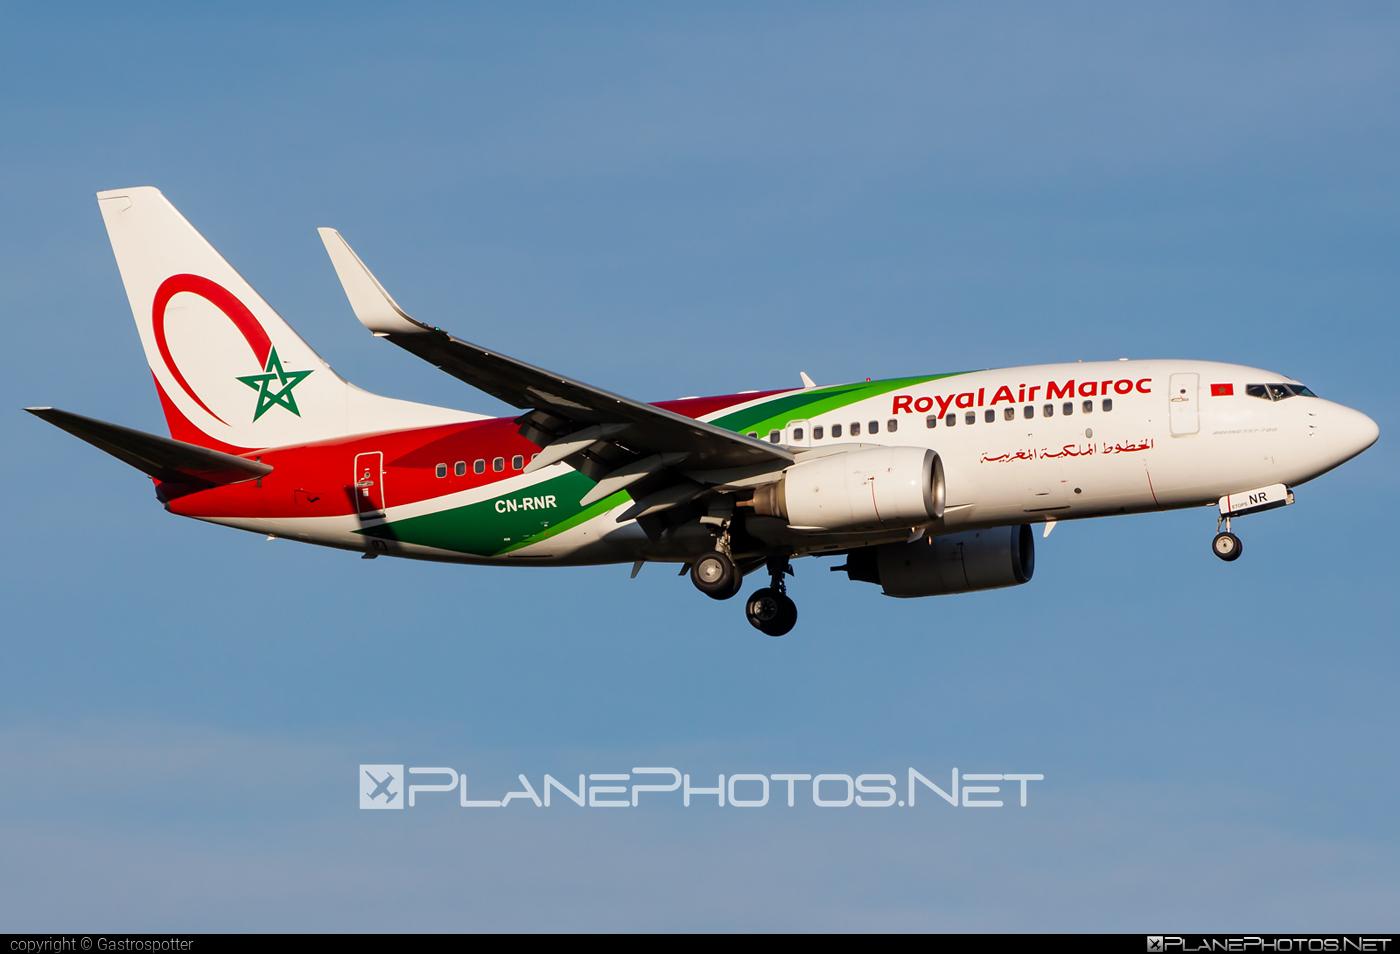 Boeing 737-700 - CN-RNR operated by Royal Air Maroc (RAM) #b737 #b737nextgen #b737ng #boeing #boeing737 #royalairmaroc